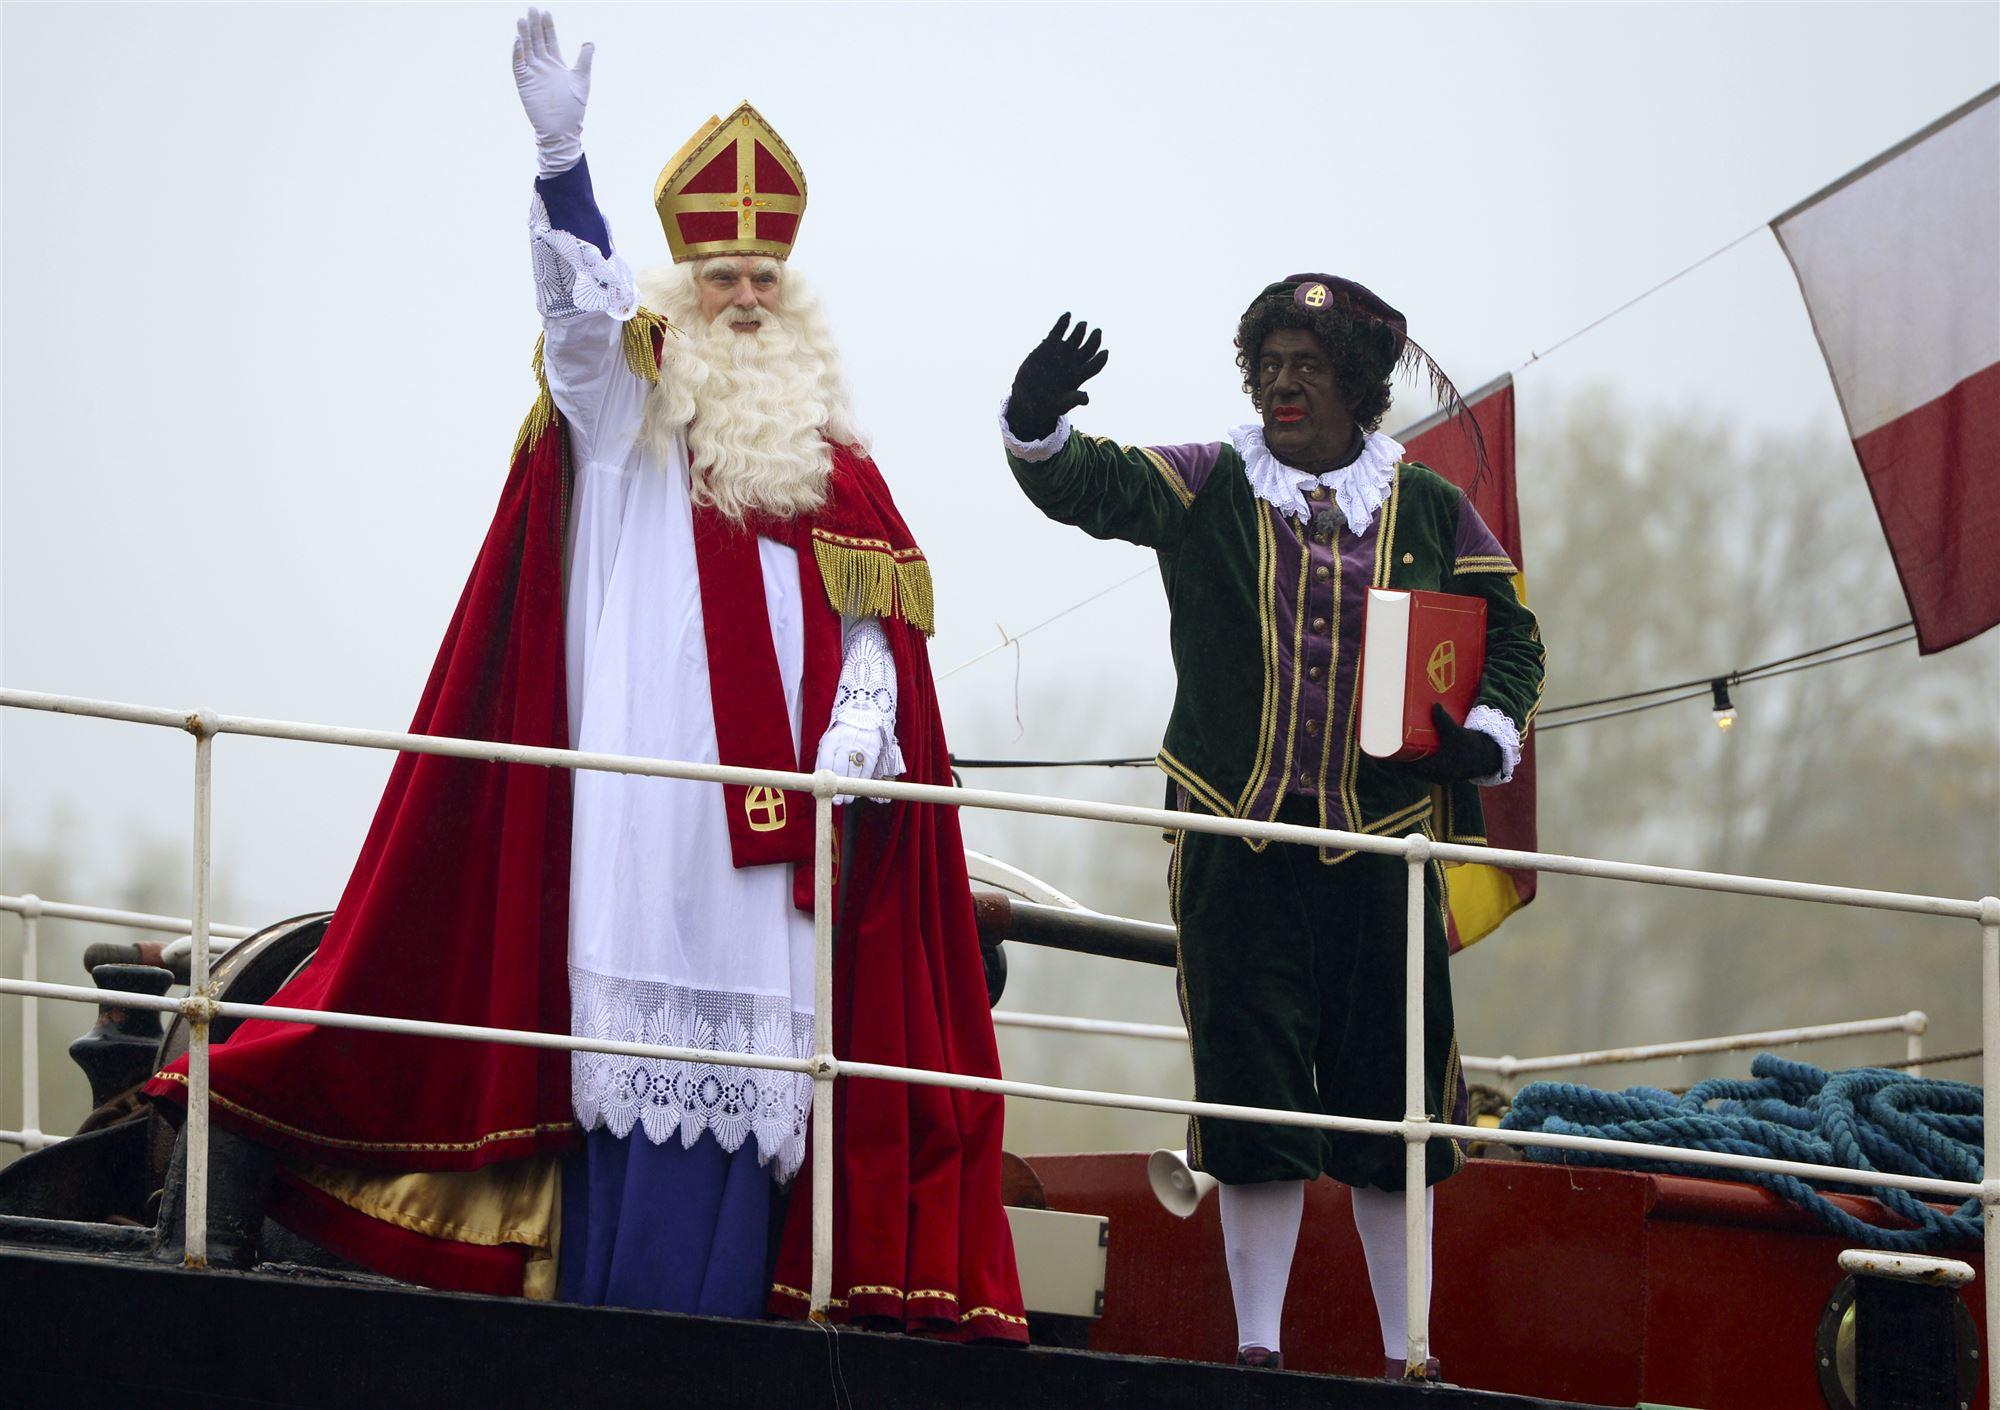 Programma intocht Sinterklaas Gouda 2018